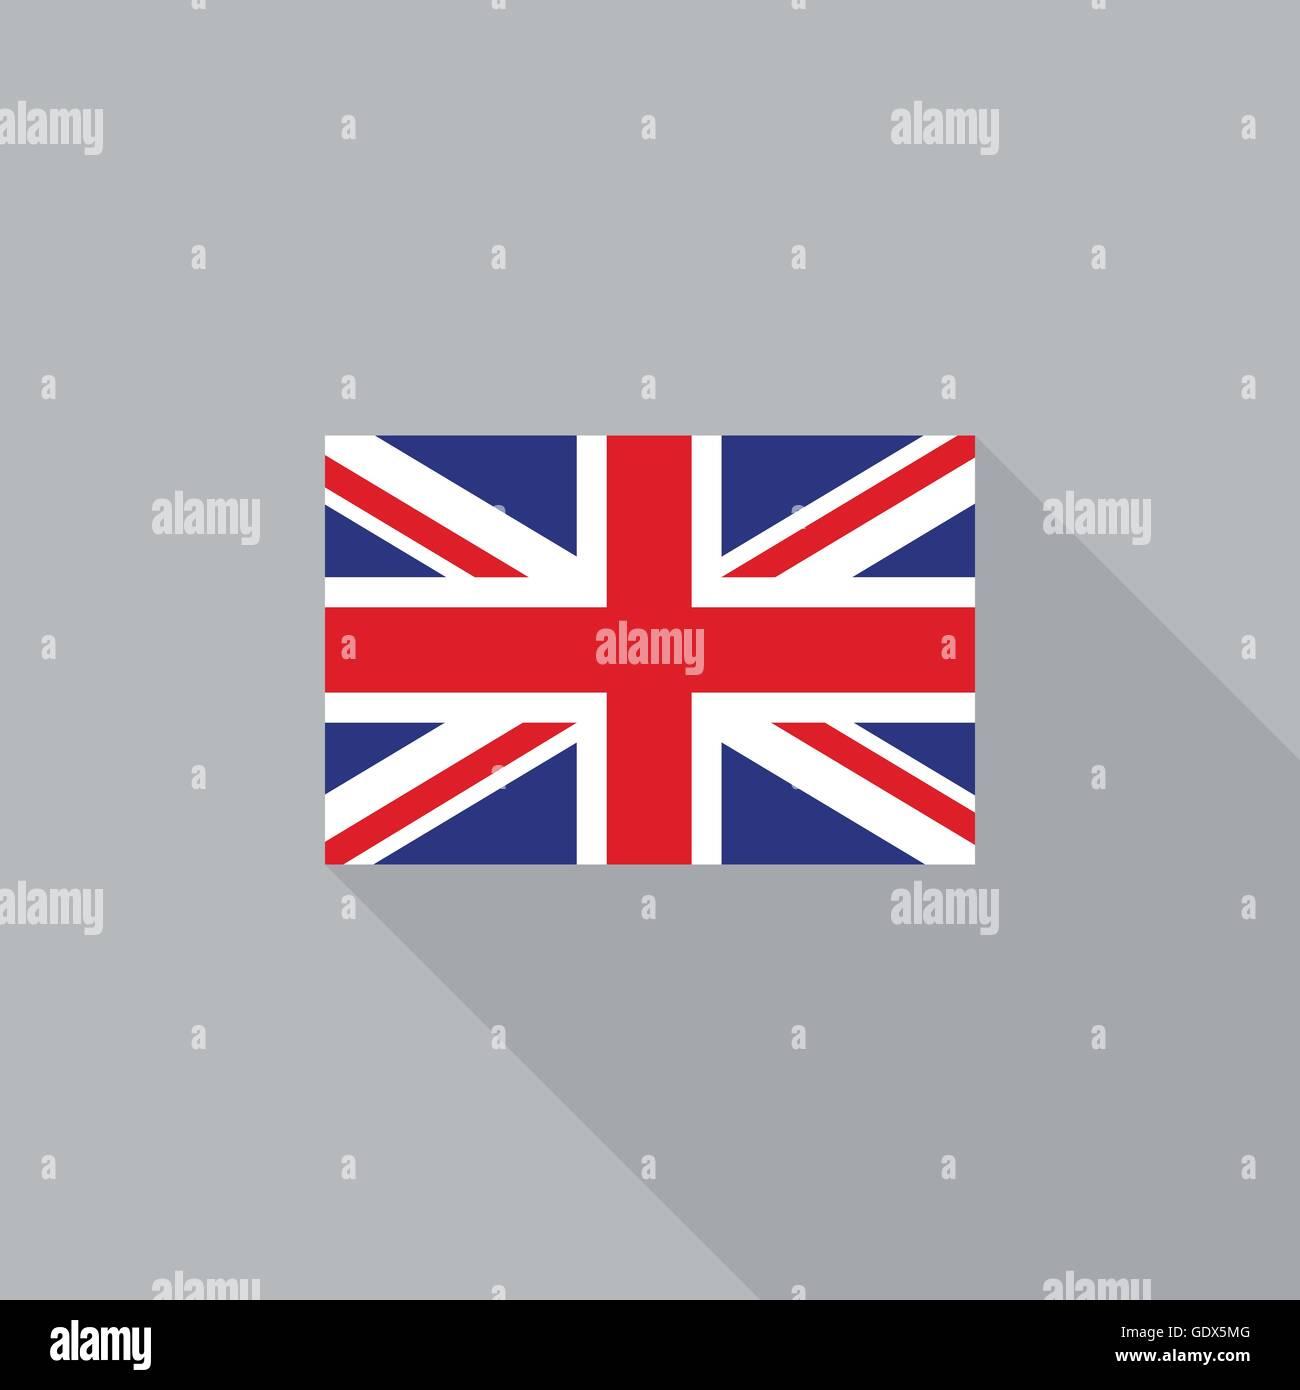 uk england flag flat design vector illustration stock vector art